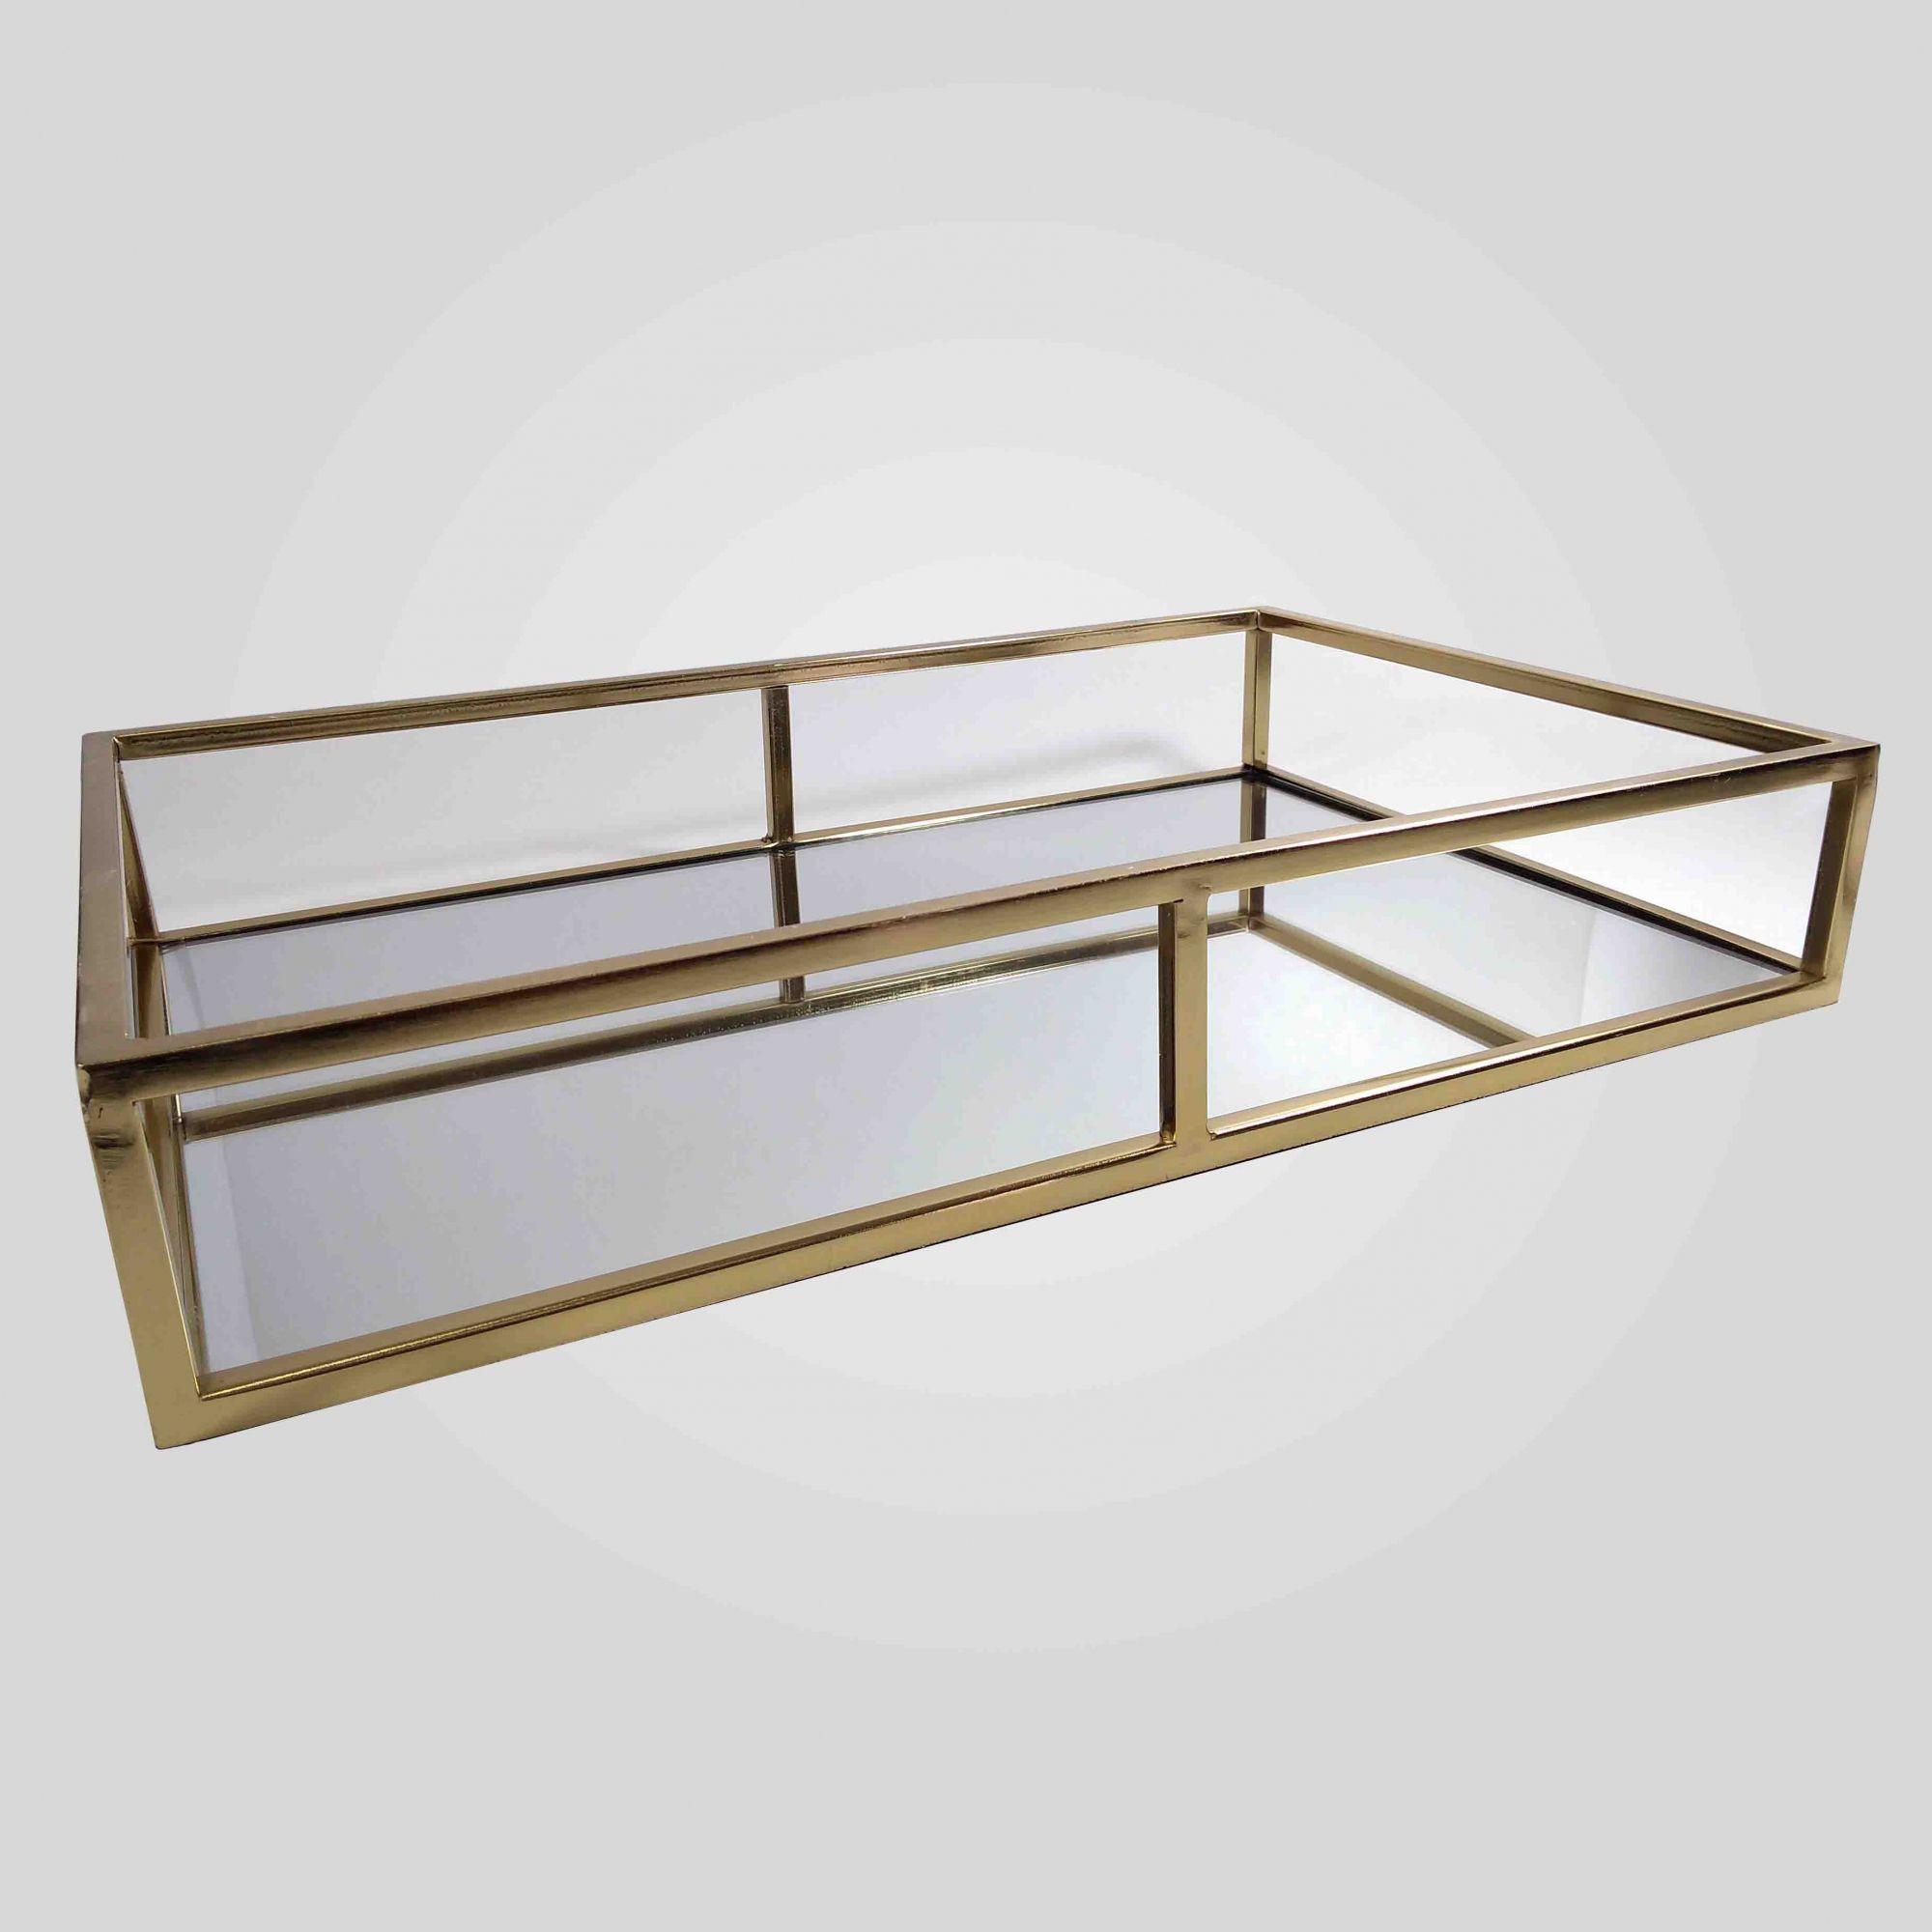 Bandeja Retangular Decorativa Espelhada Dourada 9629 40x26CM Mart Colleccion